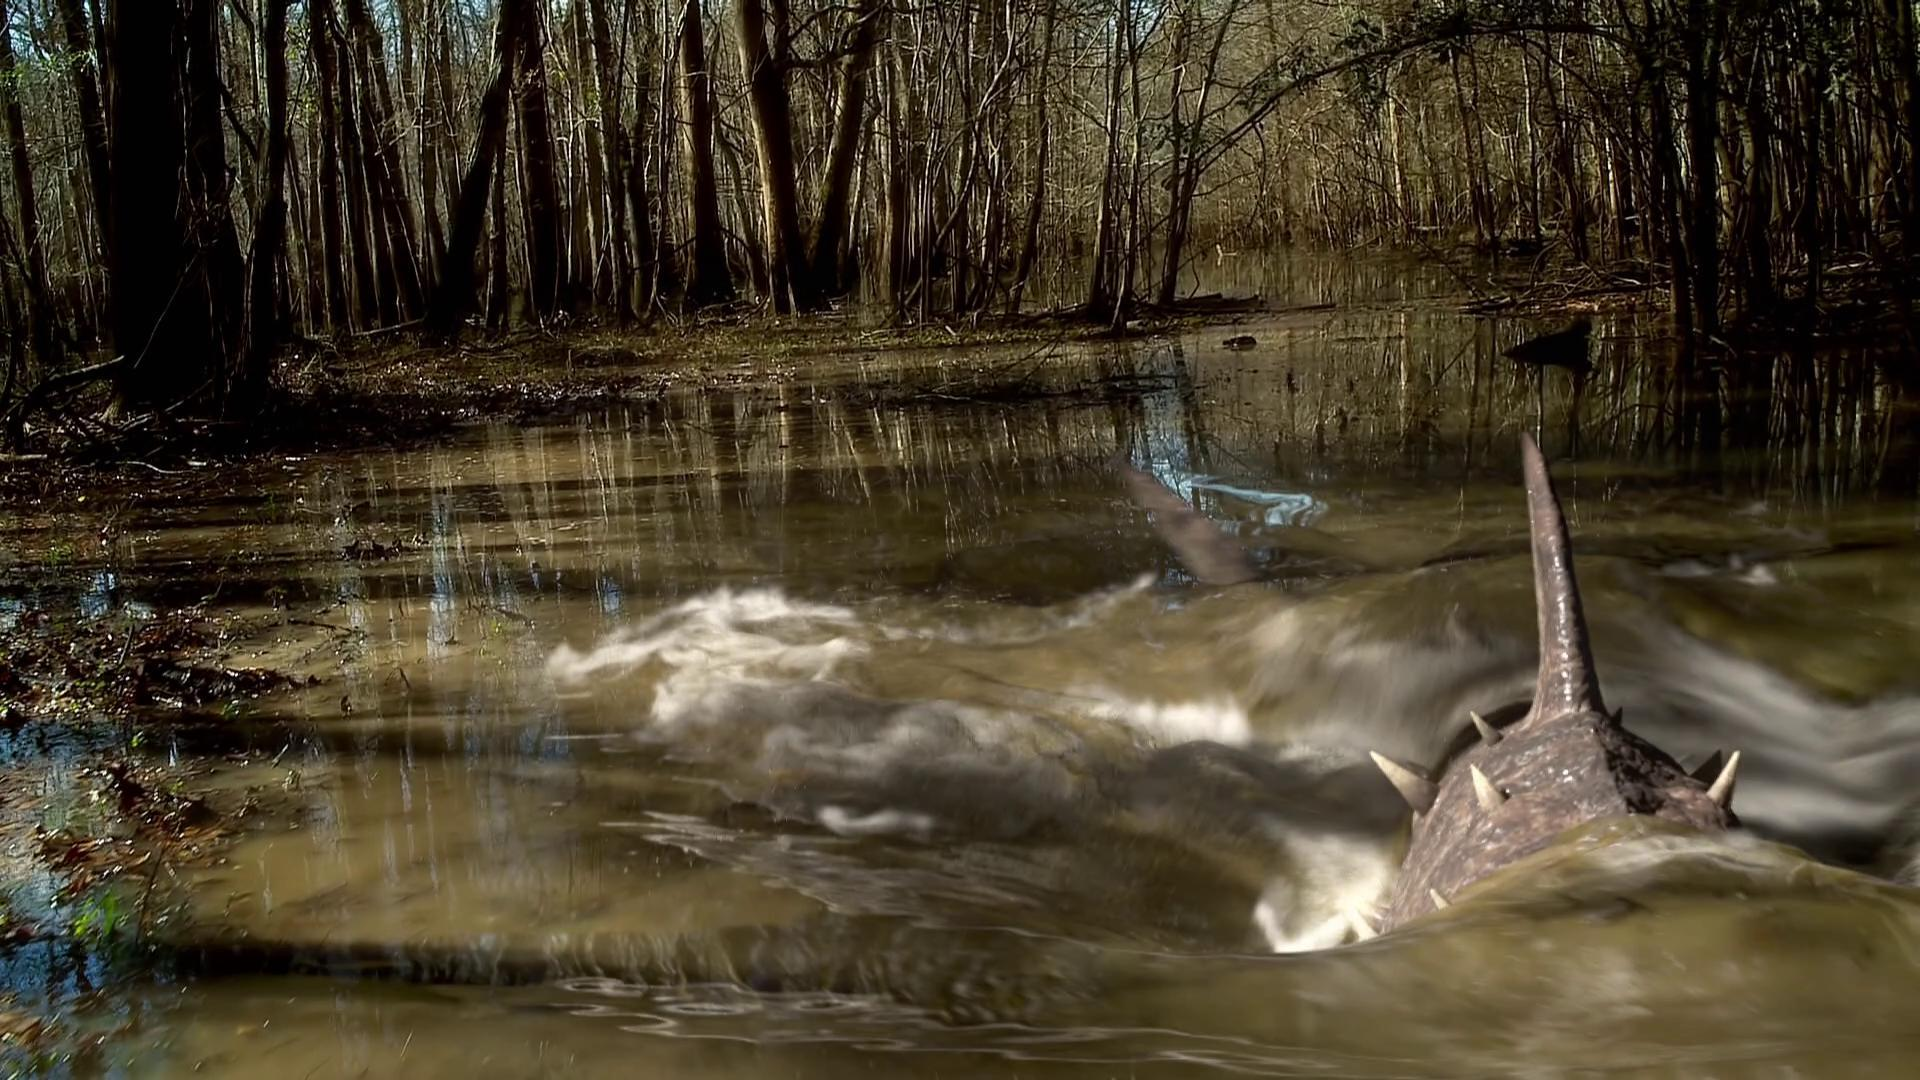 Alabama jones busty crusade stream nude gallery